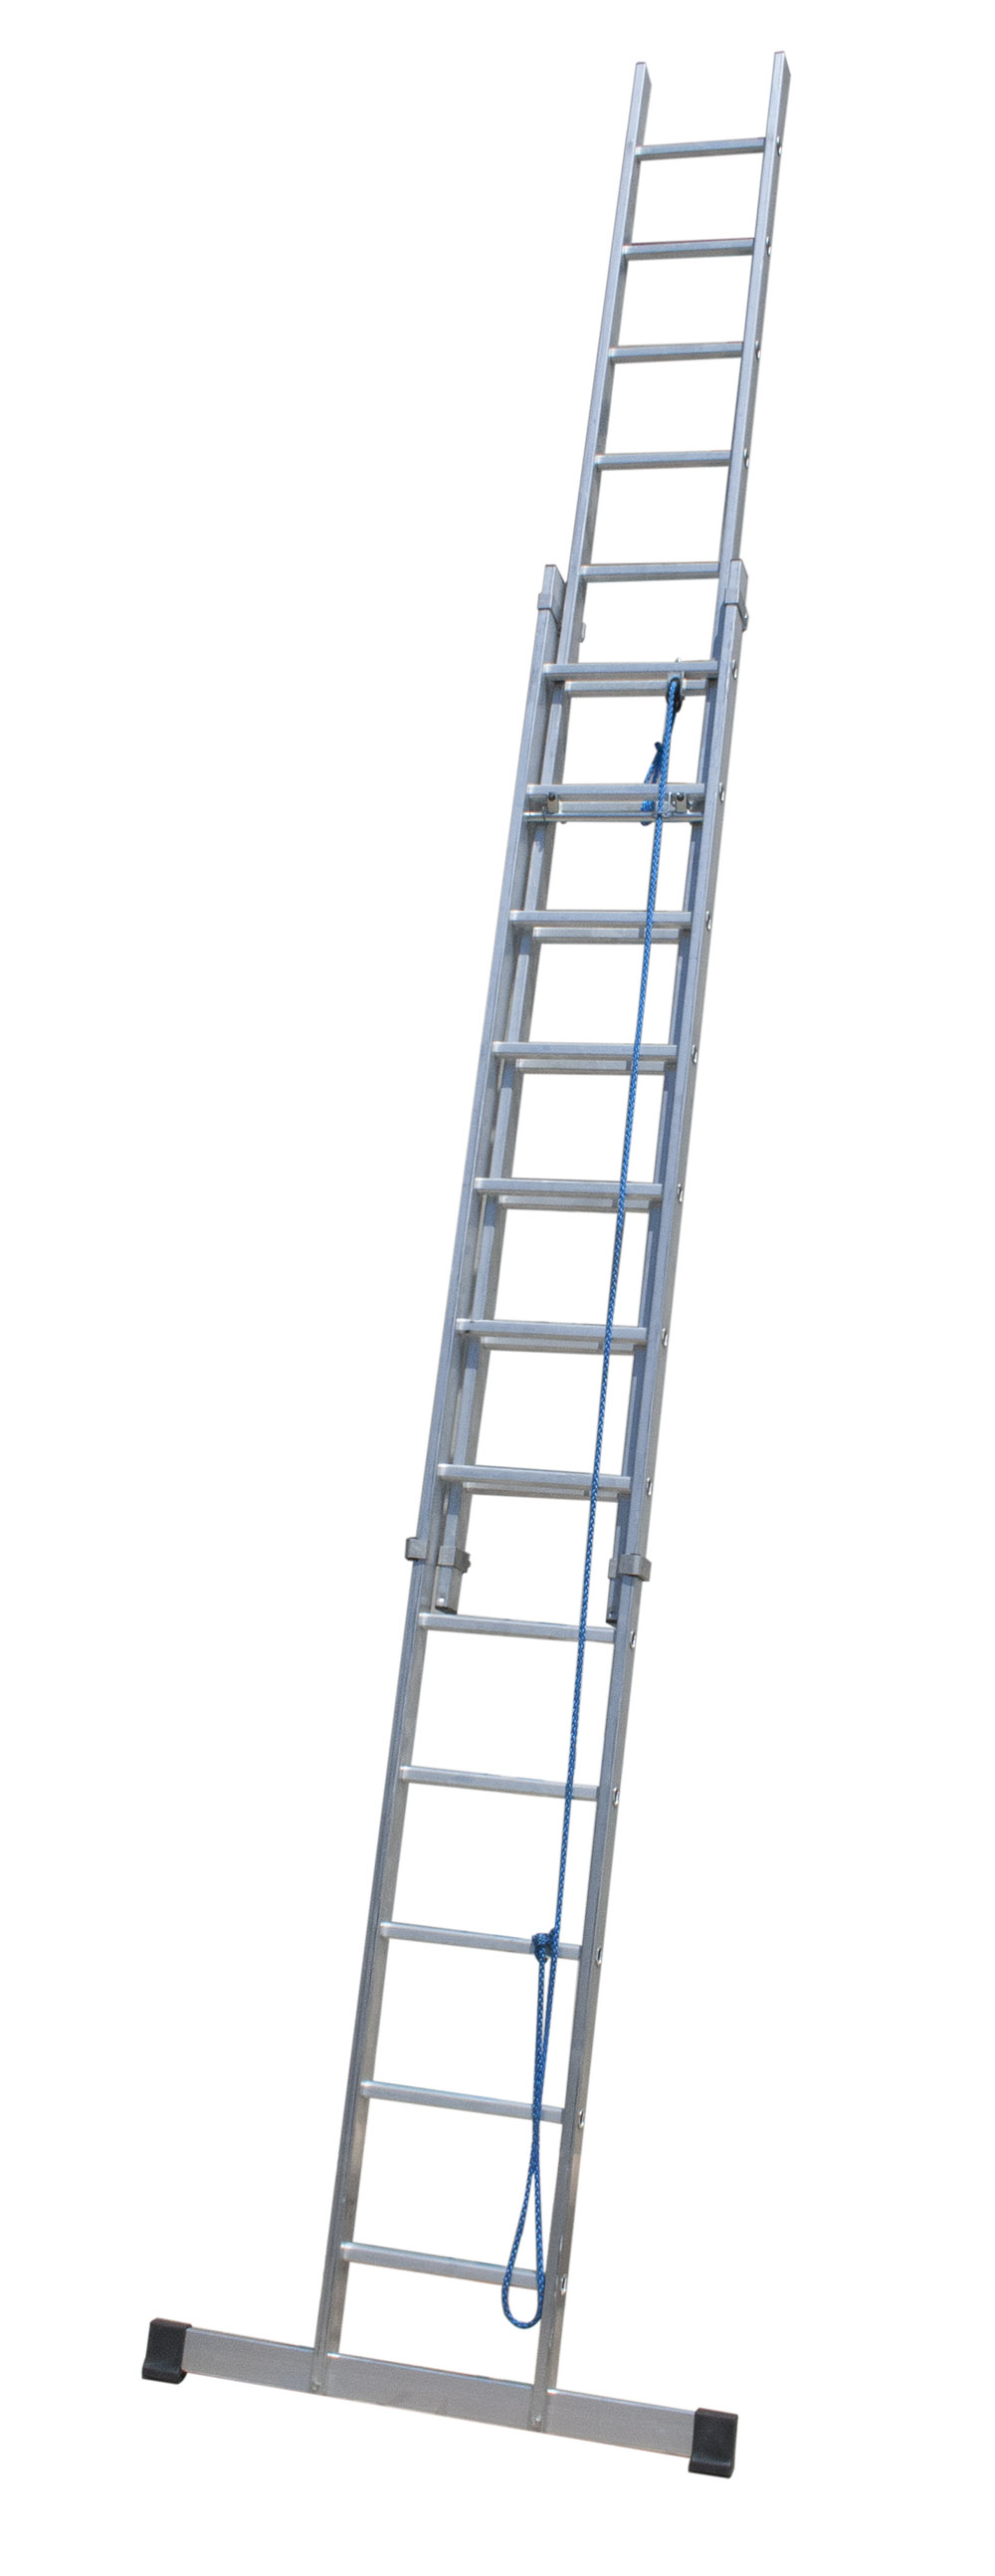 23222012-doble-ext-mecanica-sind-12peld escalera doble extensión mecánica Escalera doble extensión mecánica 23222012 doble ext mecanica sind 12peld